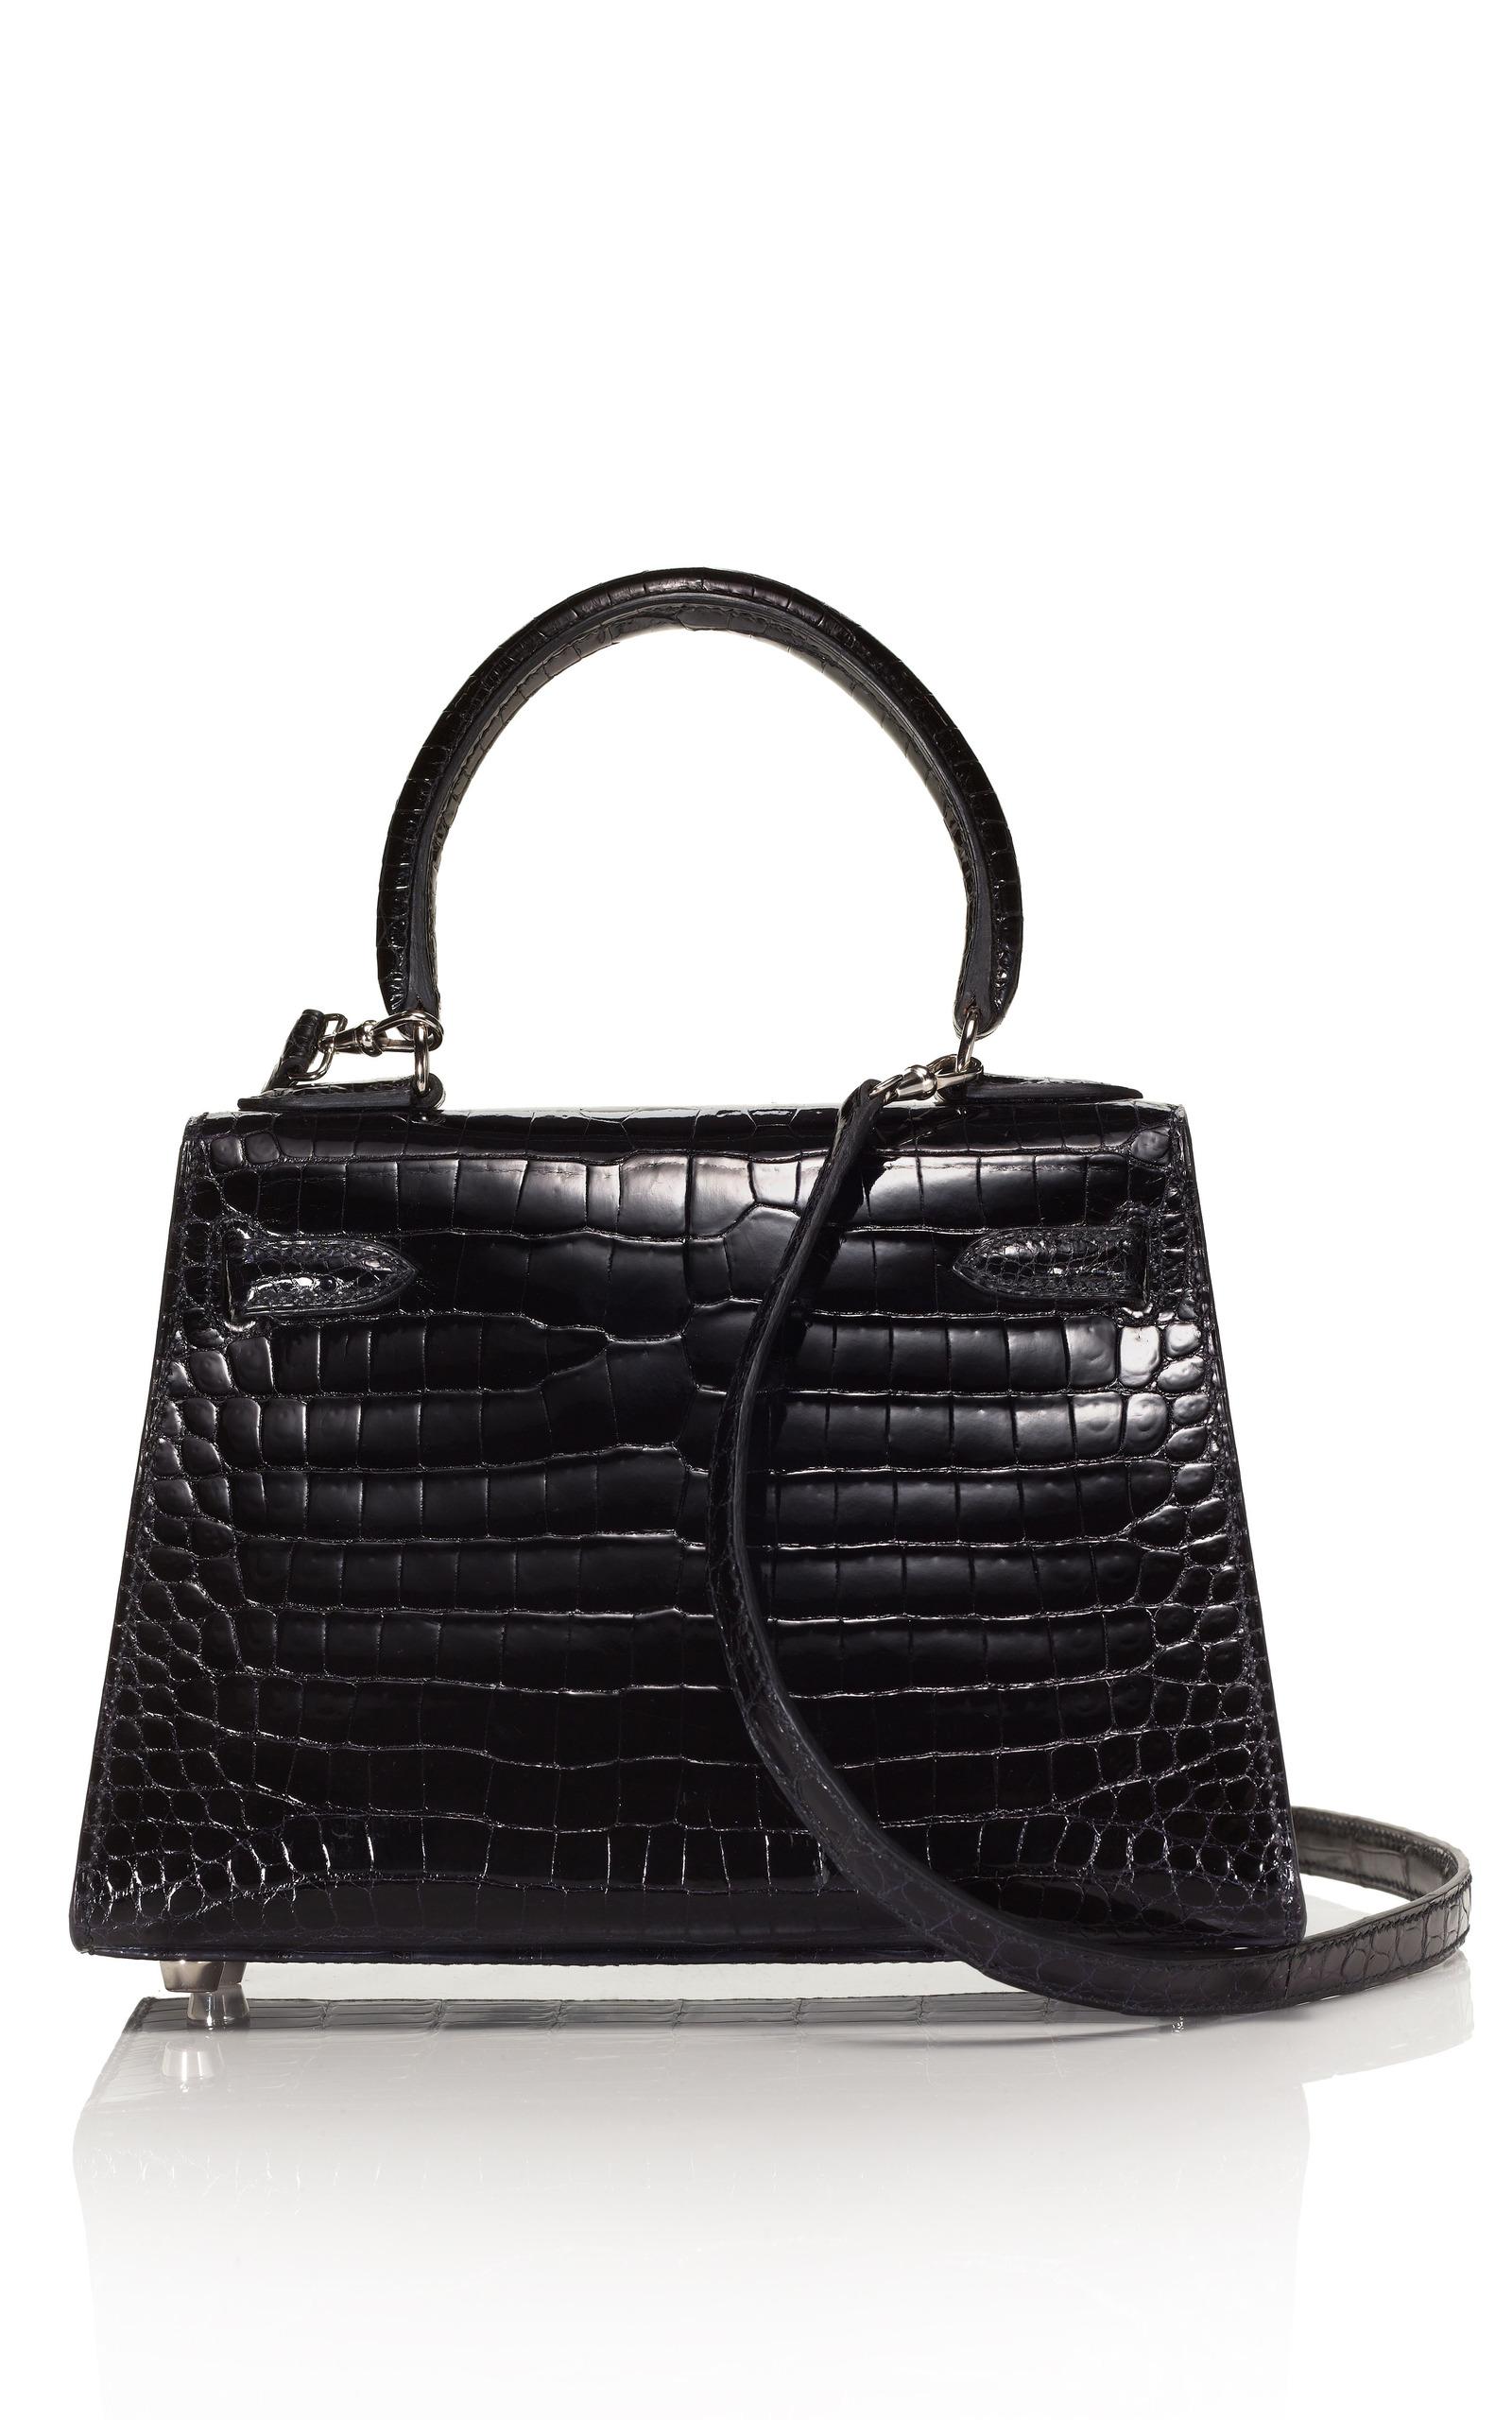 298ff3259ea1 Hermes Vintage20cm Black Shiny Porosus Crocodile Mini Kelly. CLOSE. Loading